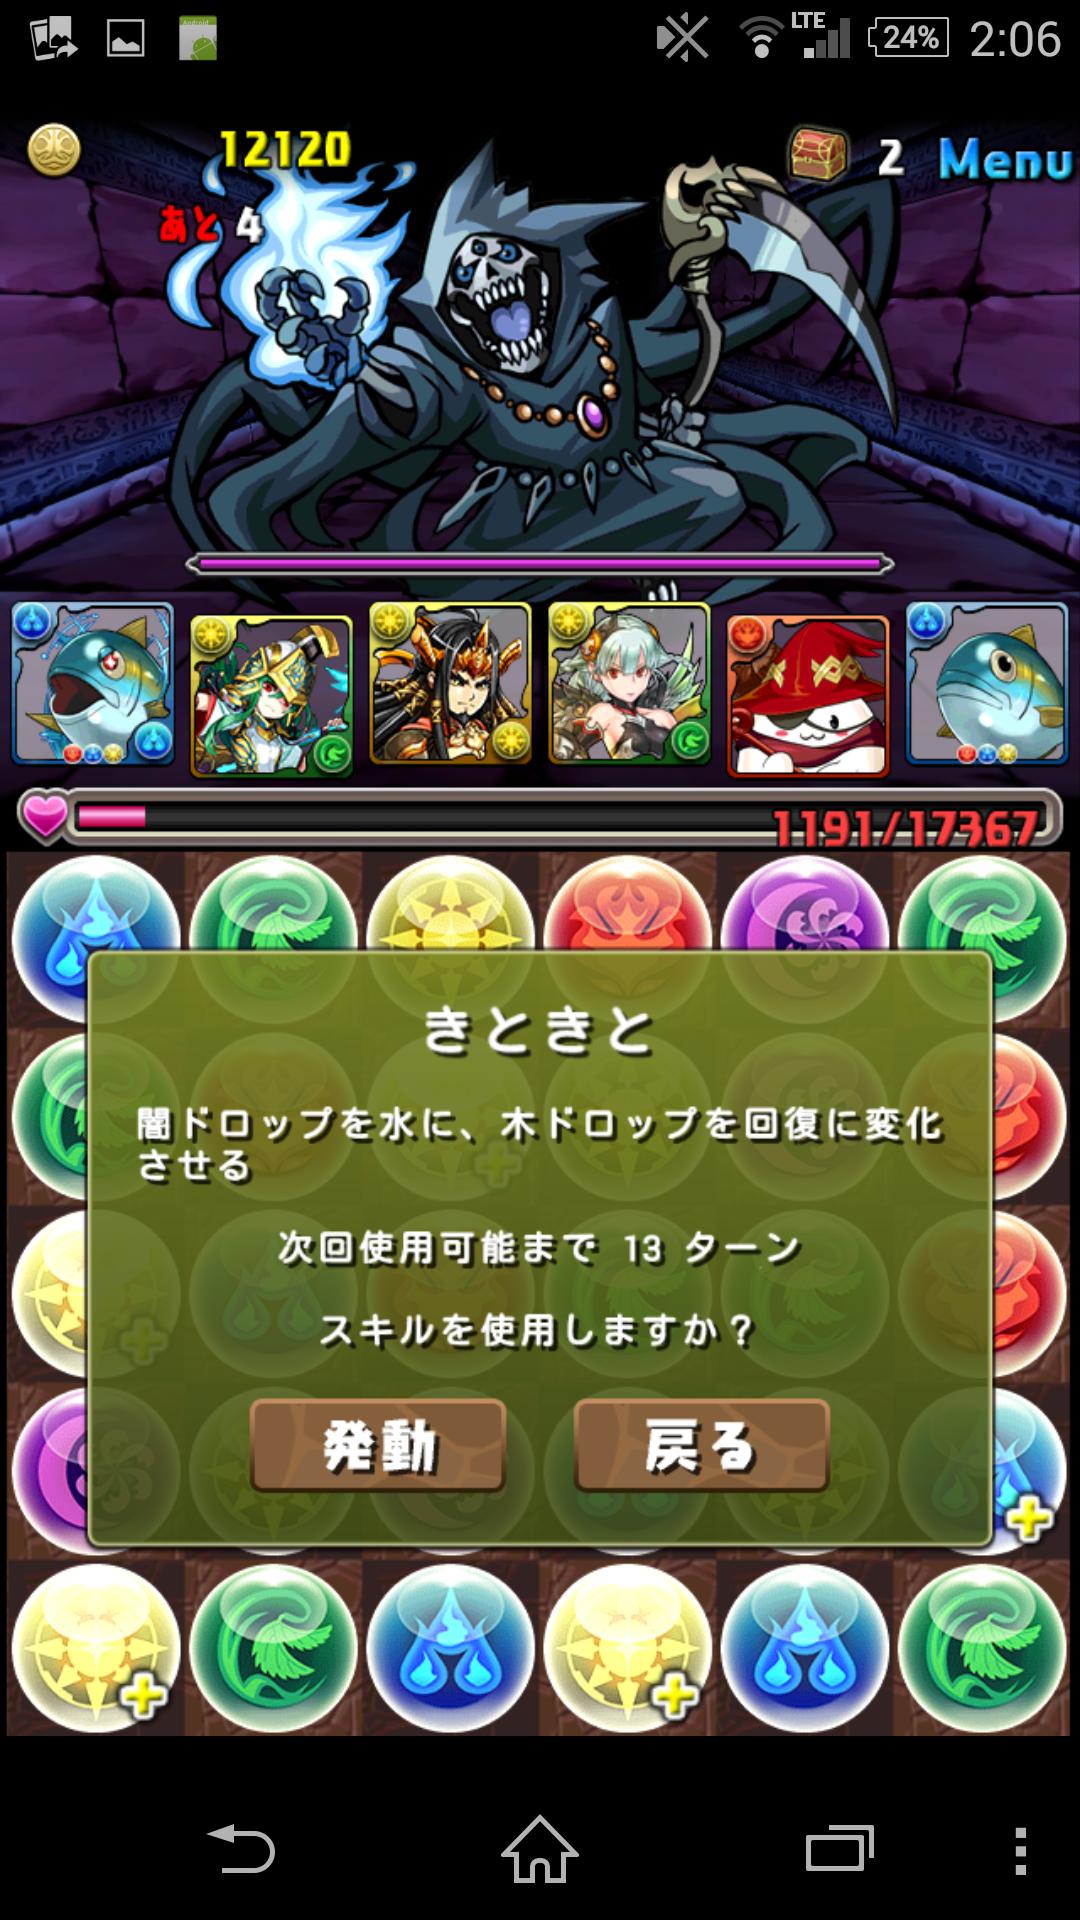 Screenshot_2014-09-30-02-06-20.png